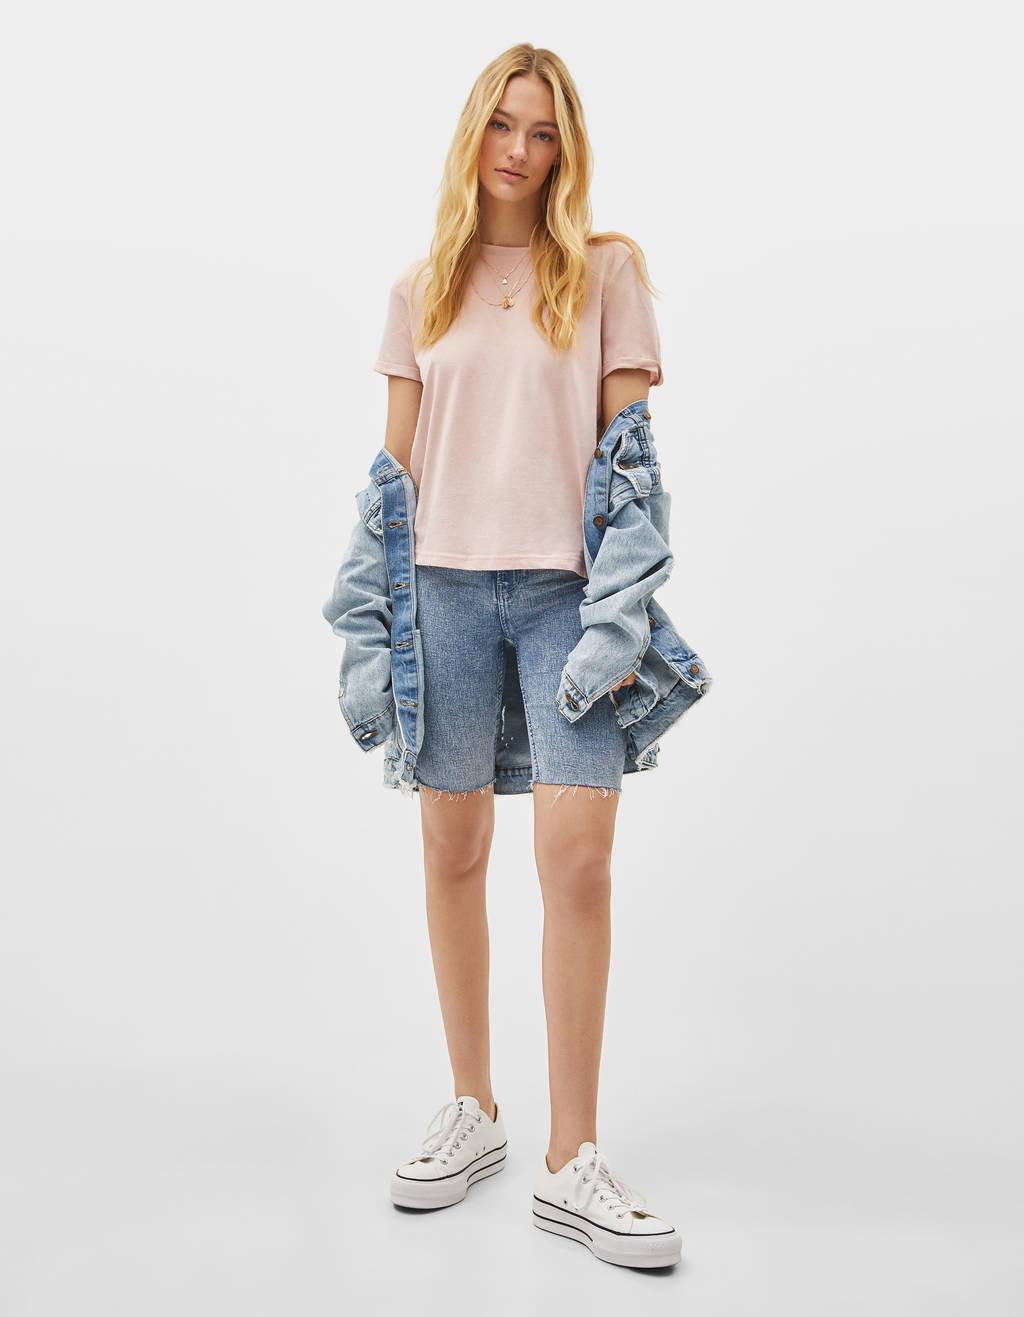 e956be53ffc6d6 T-Shirts für Damen - Frühjahr Sommer 2019